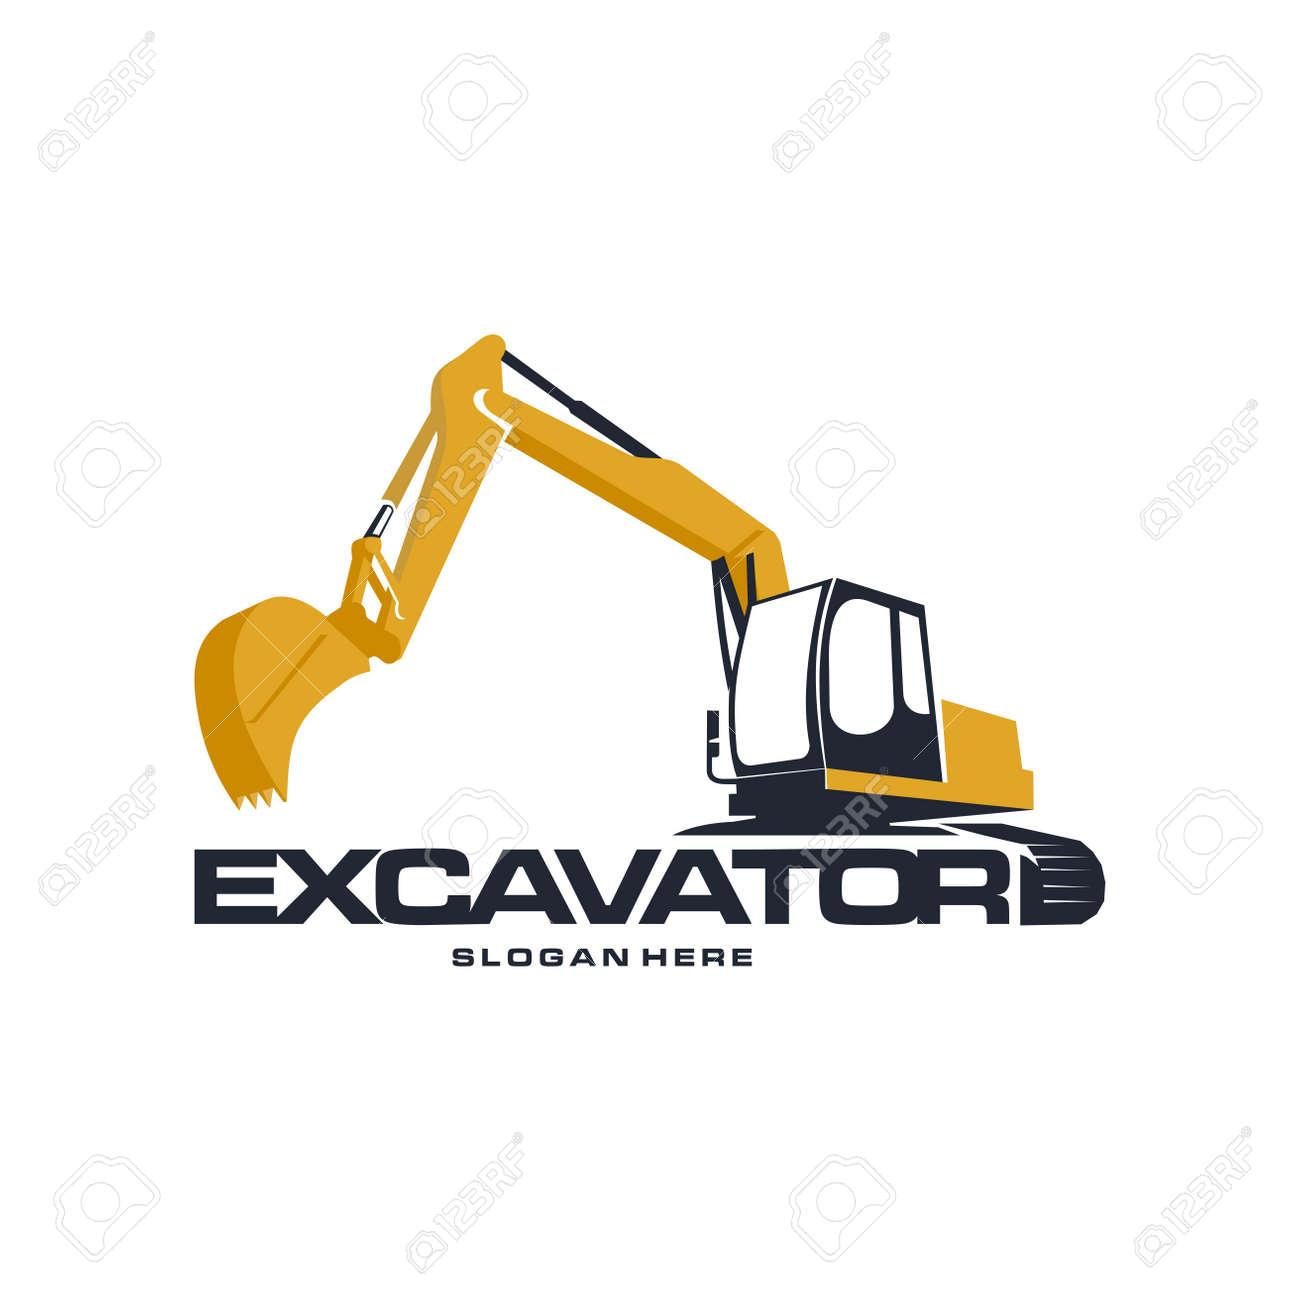 Excavator logo designs concept vector illustration - 140281253